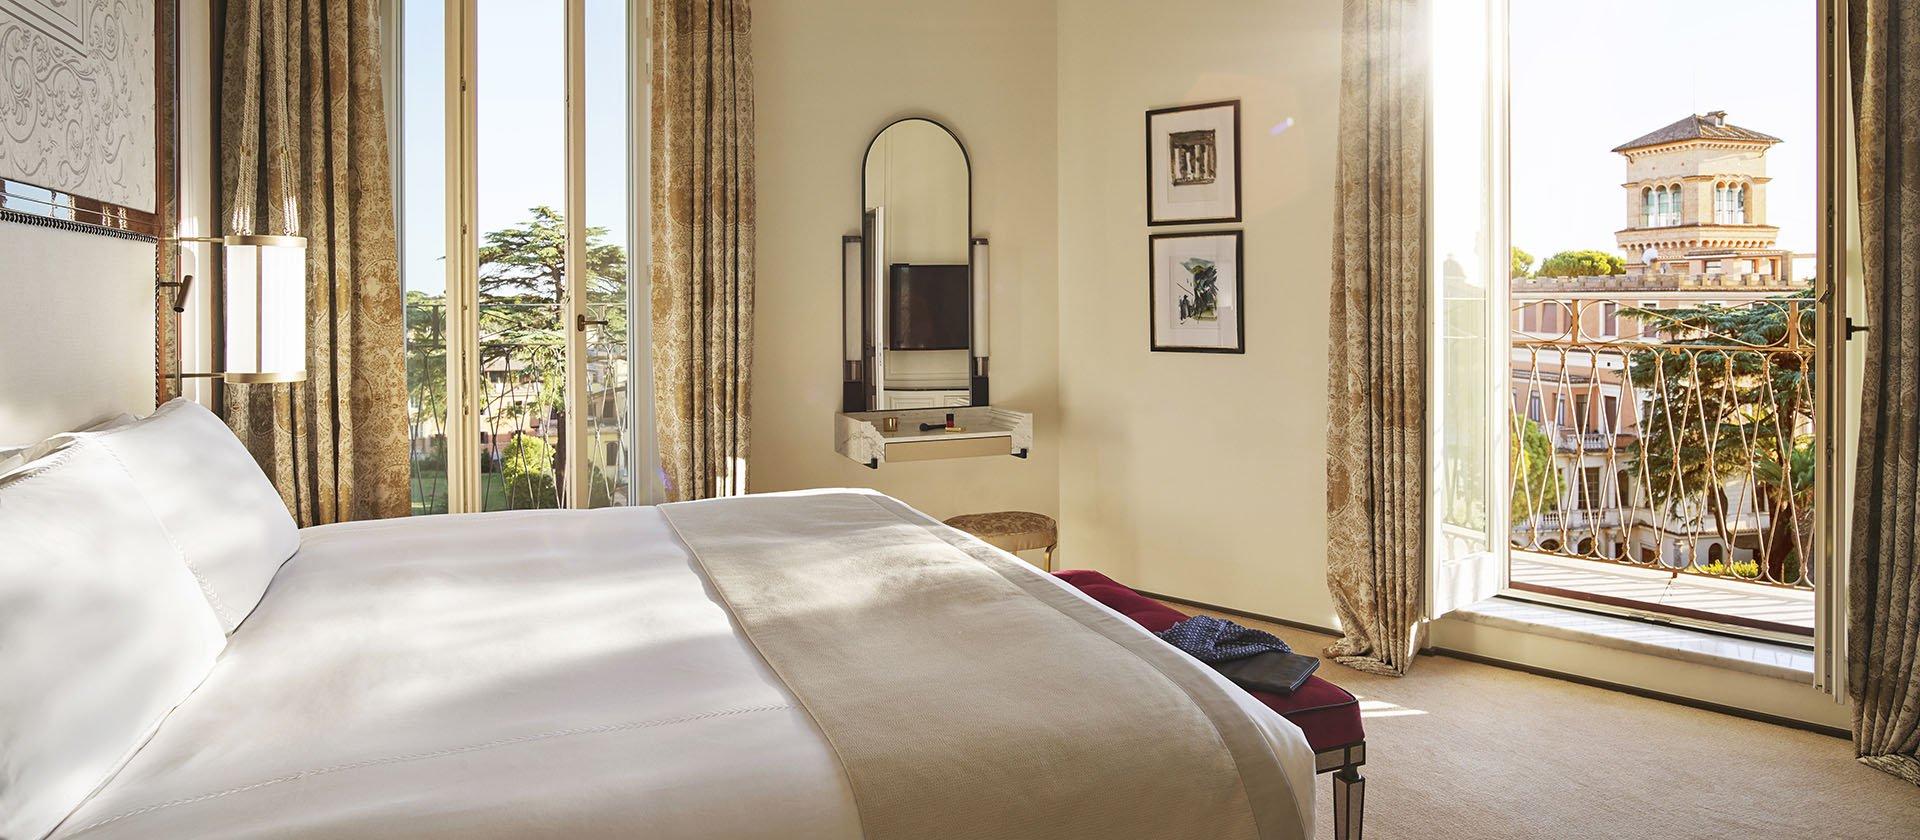 Bedroom inside the VIlla Medici Presidential Suite at Hotel Eden